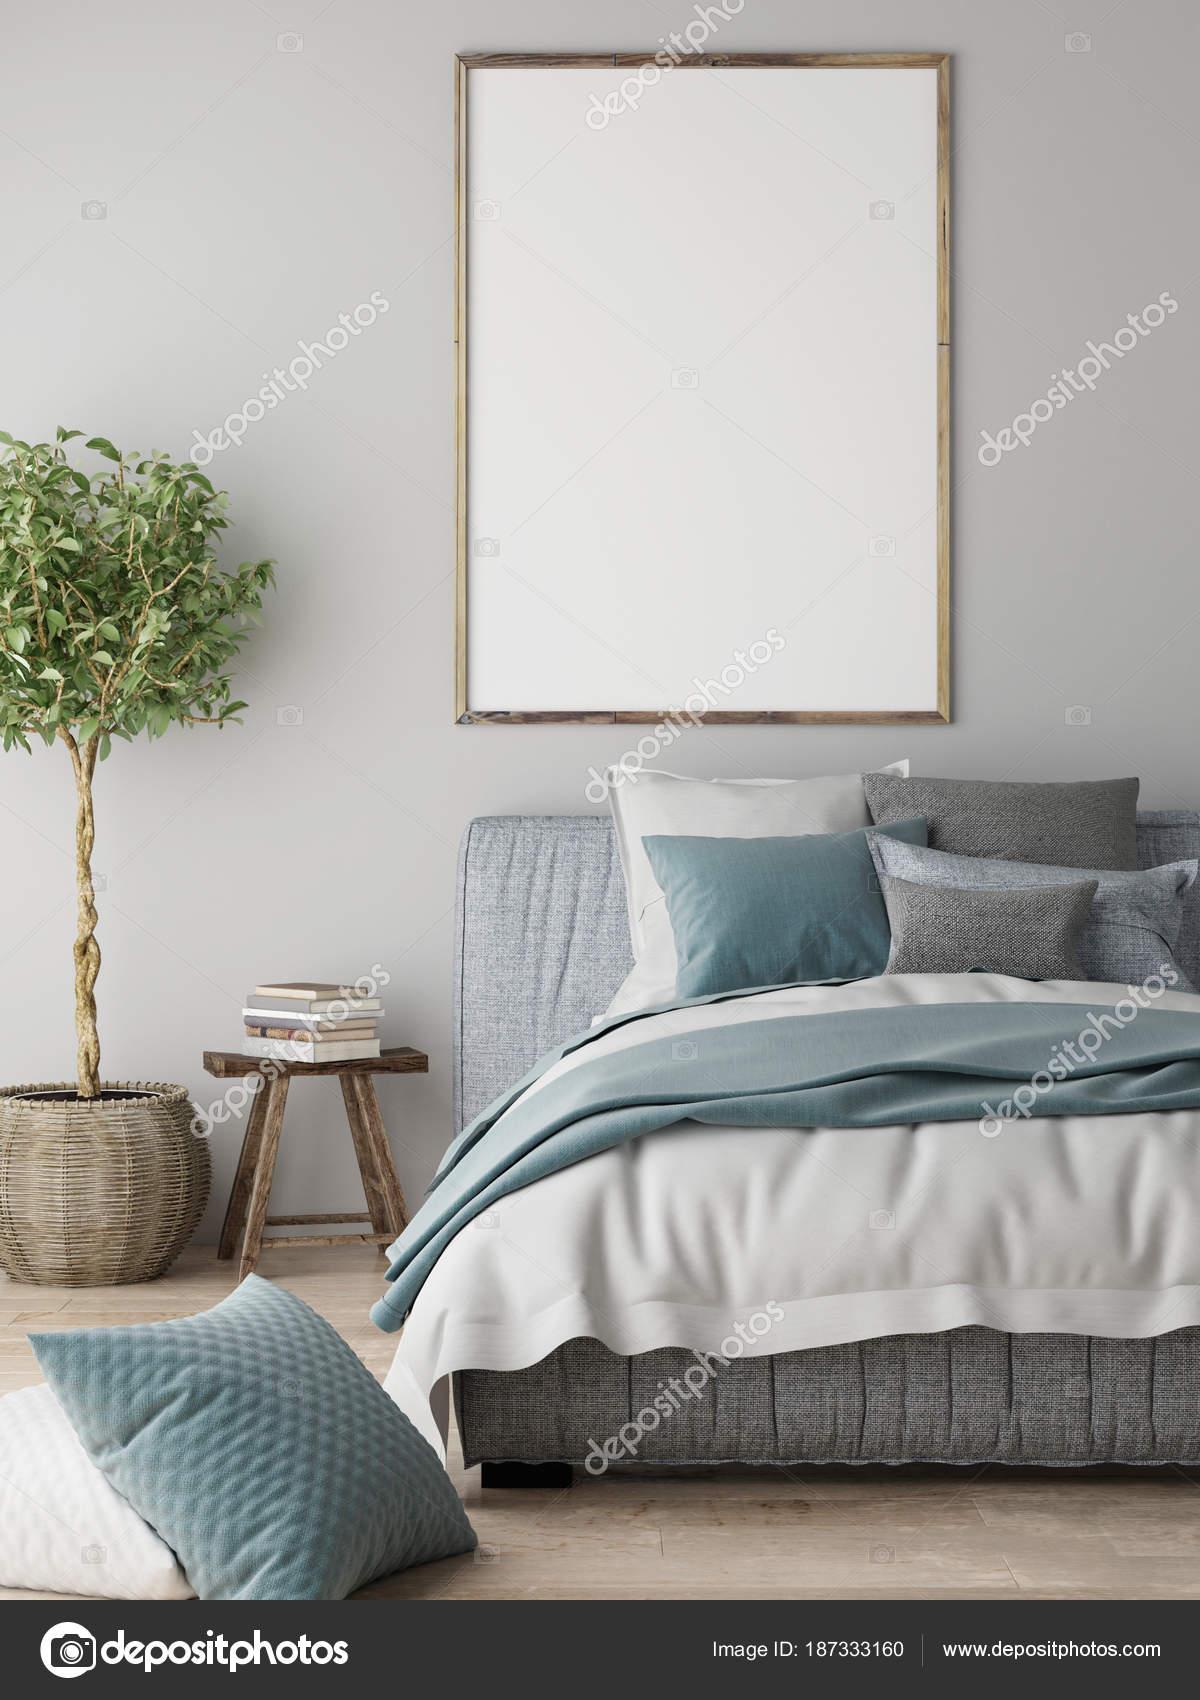 https://st3.depositphotos.com/2332949/18733/i/1600/depositphotos_187333160-stockafbeelding-mock-poster-slaapkamer-interieur-concept.jpg